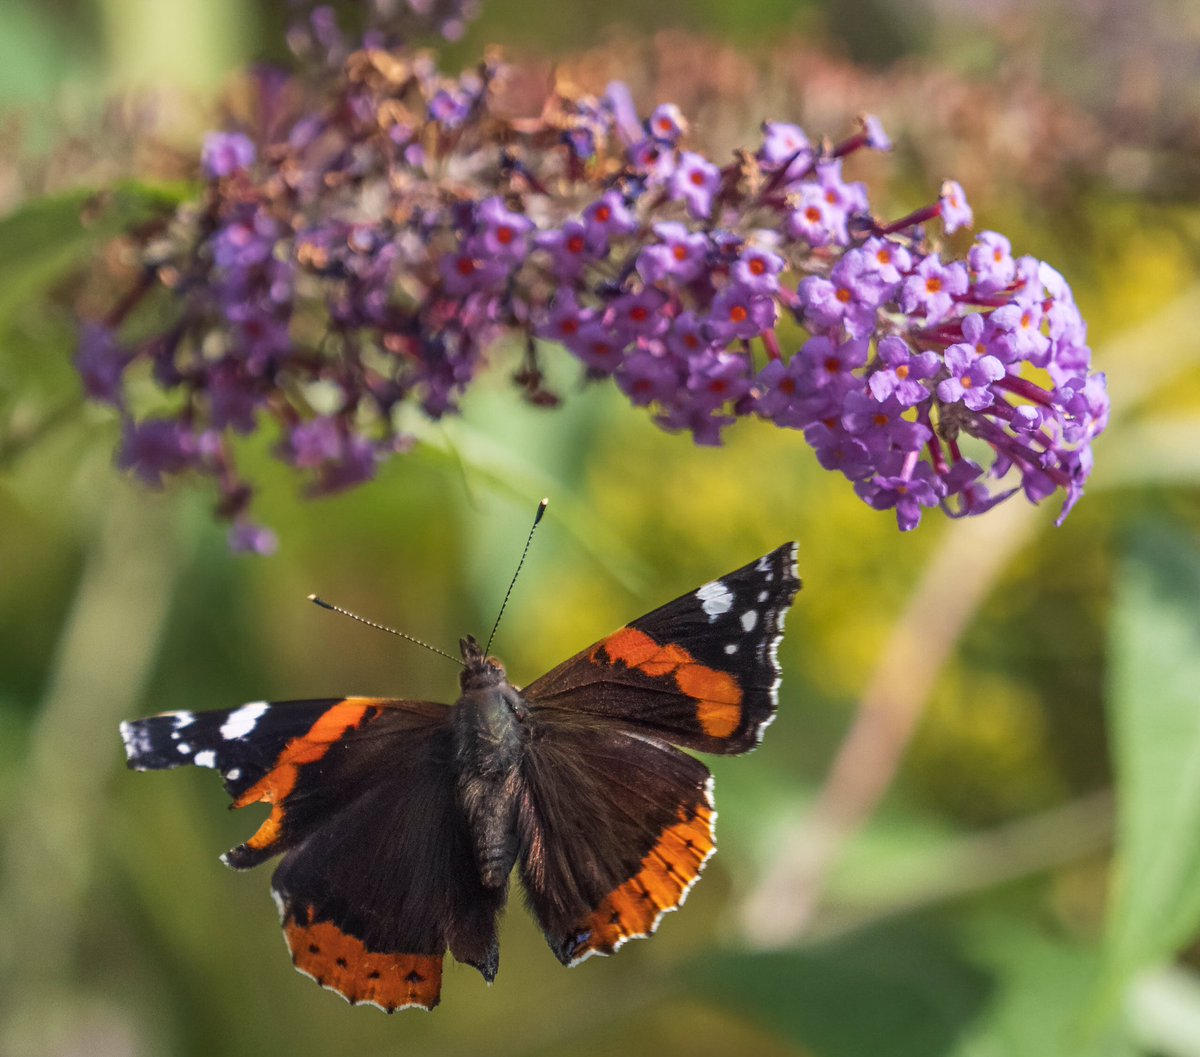 Red admiral, rather tatty, about to land on buddleia @BC_WestMids @savebutterflies #wexmondays #BBCWildlifePOTD https://t.co/3Vav4Rzwf7